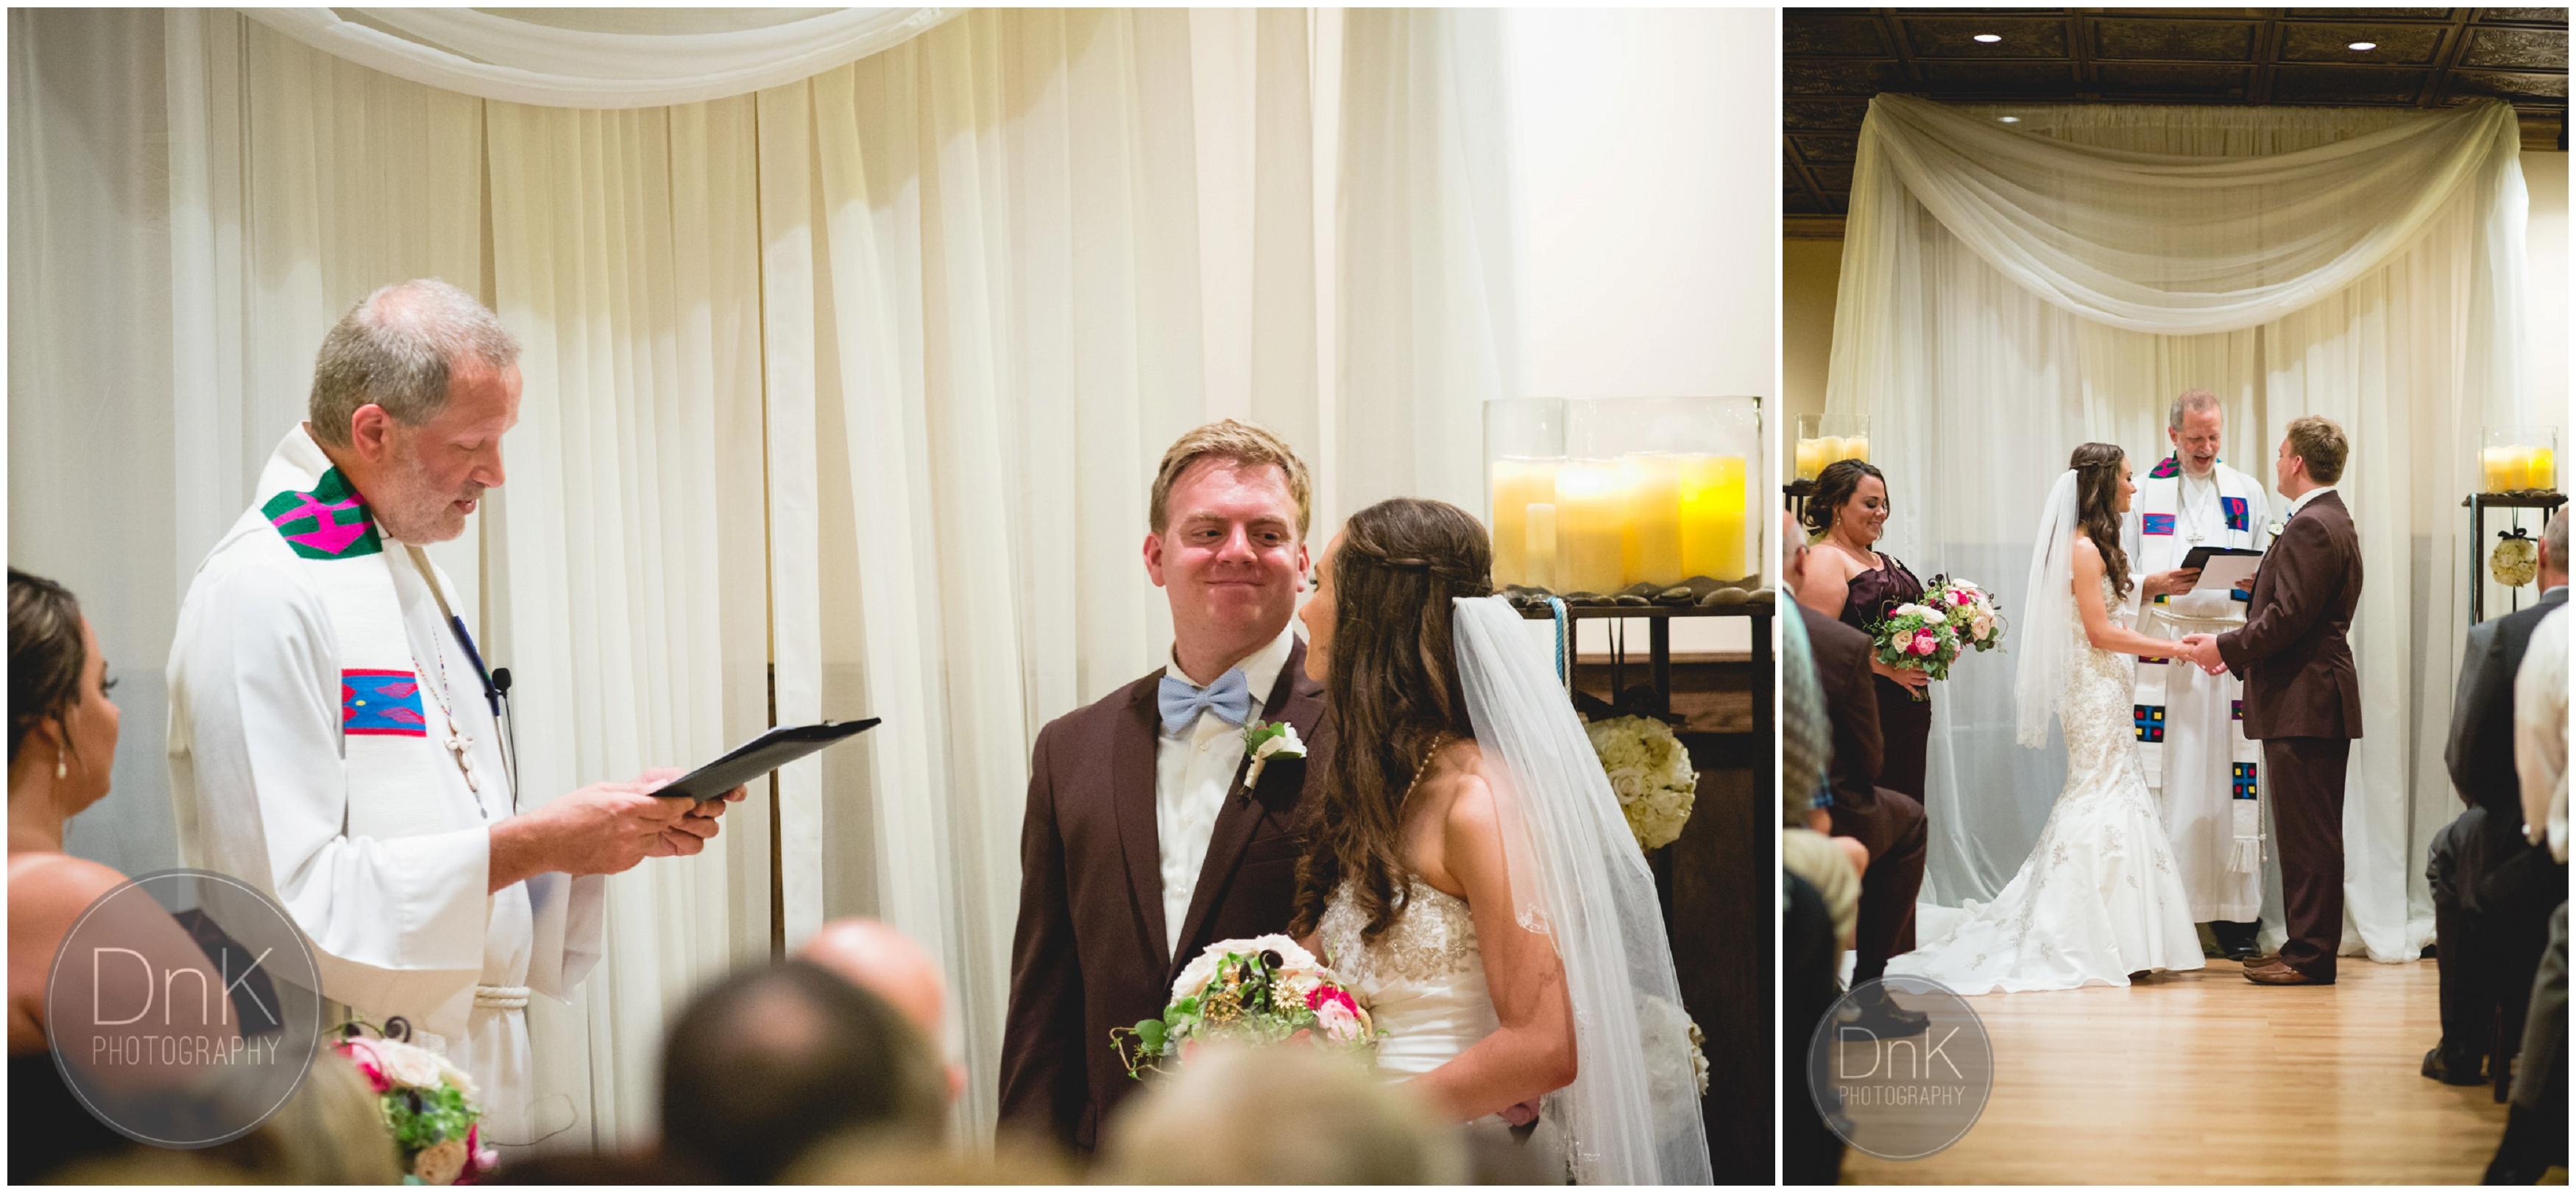 19 - 413 on Wacouta Wedding Ceremony